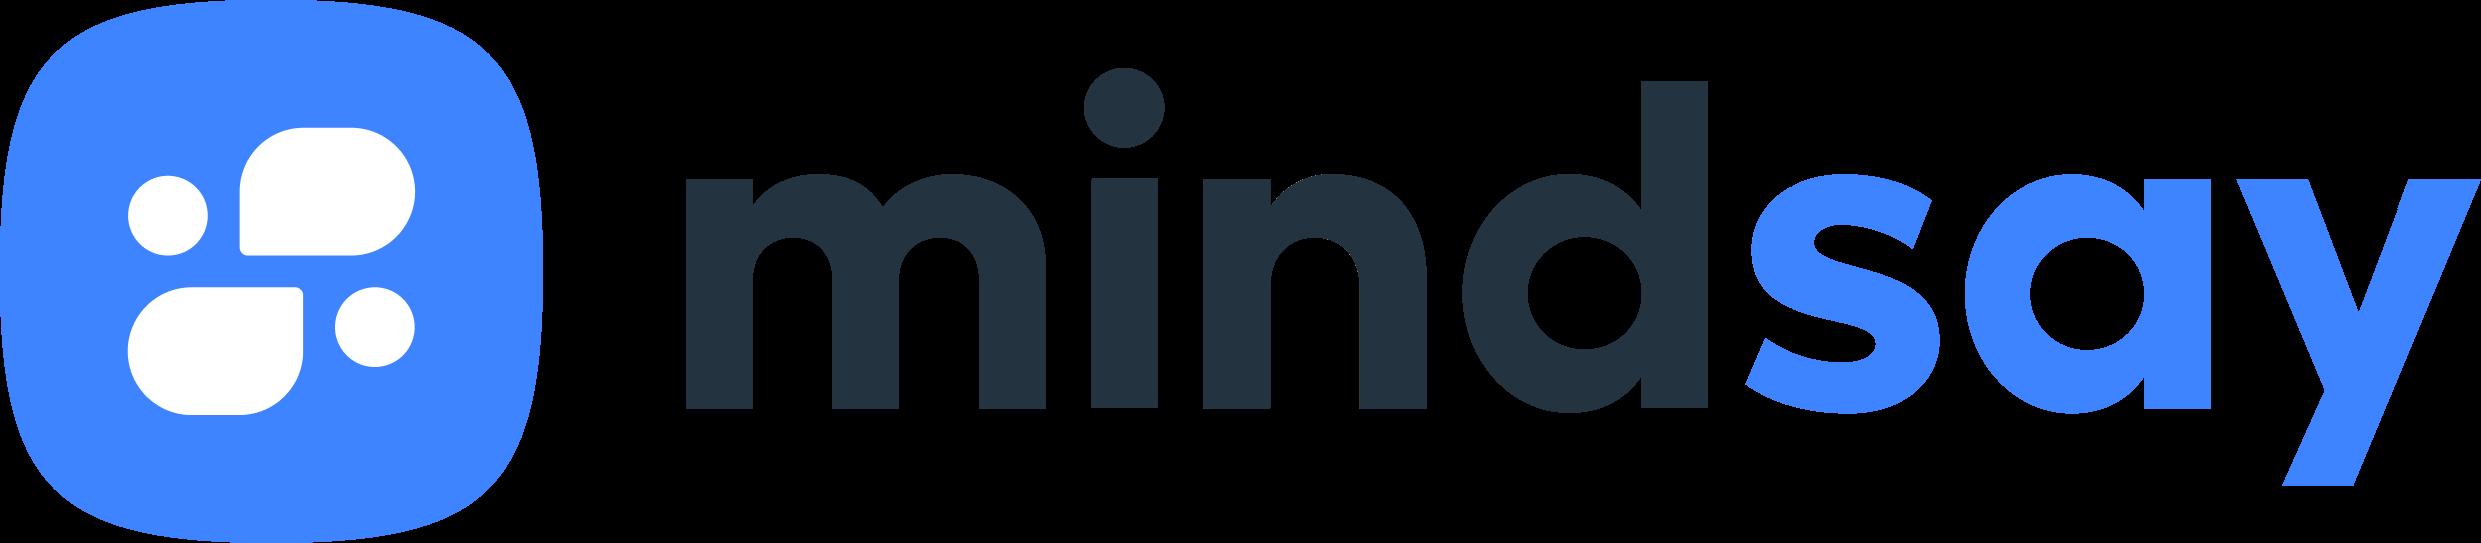 Mindsay logo